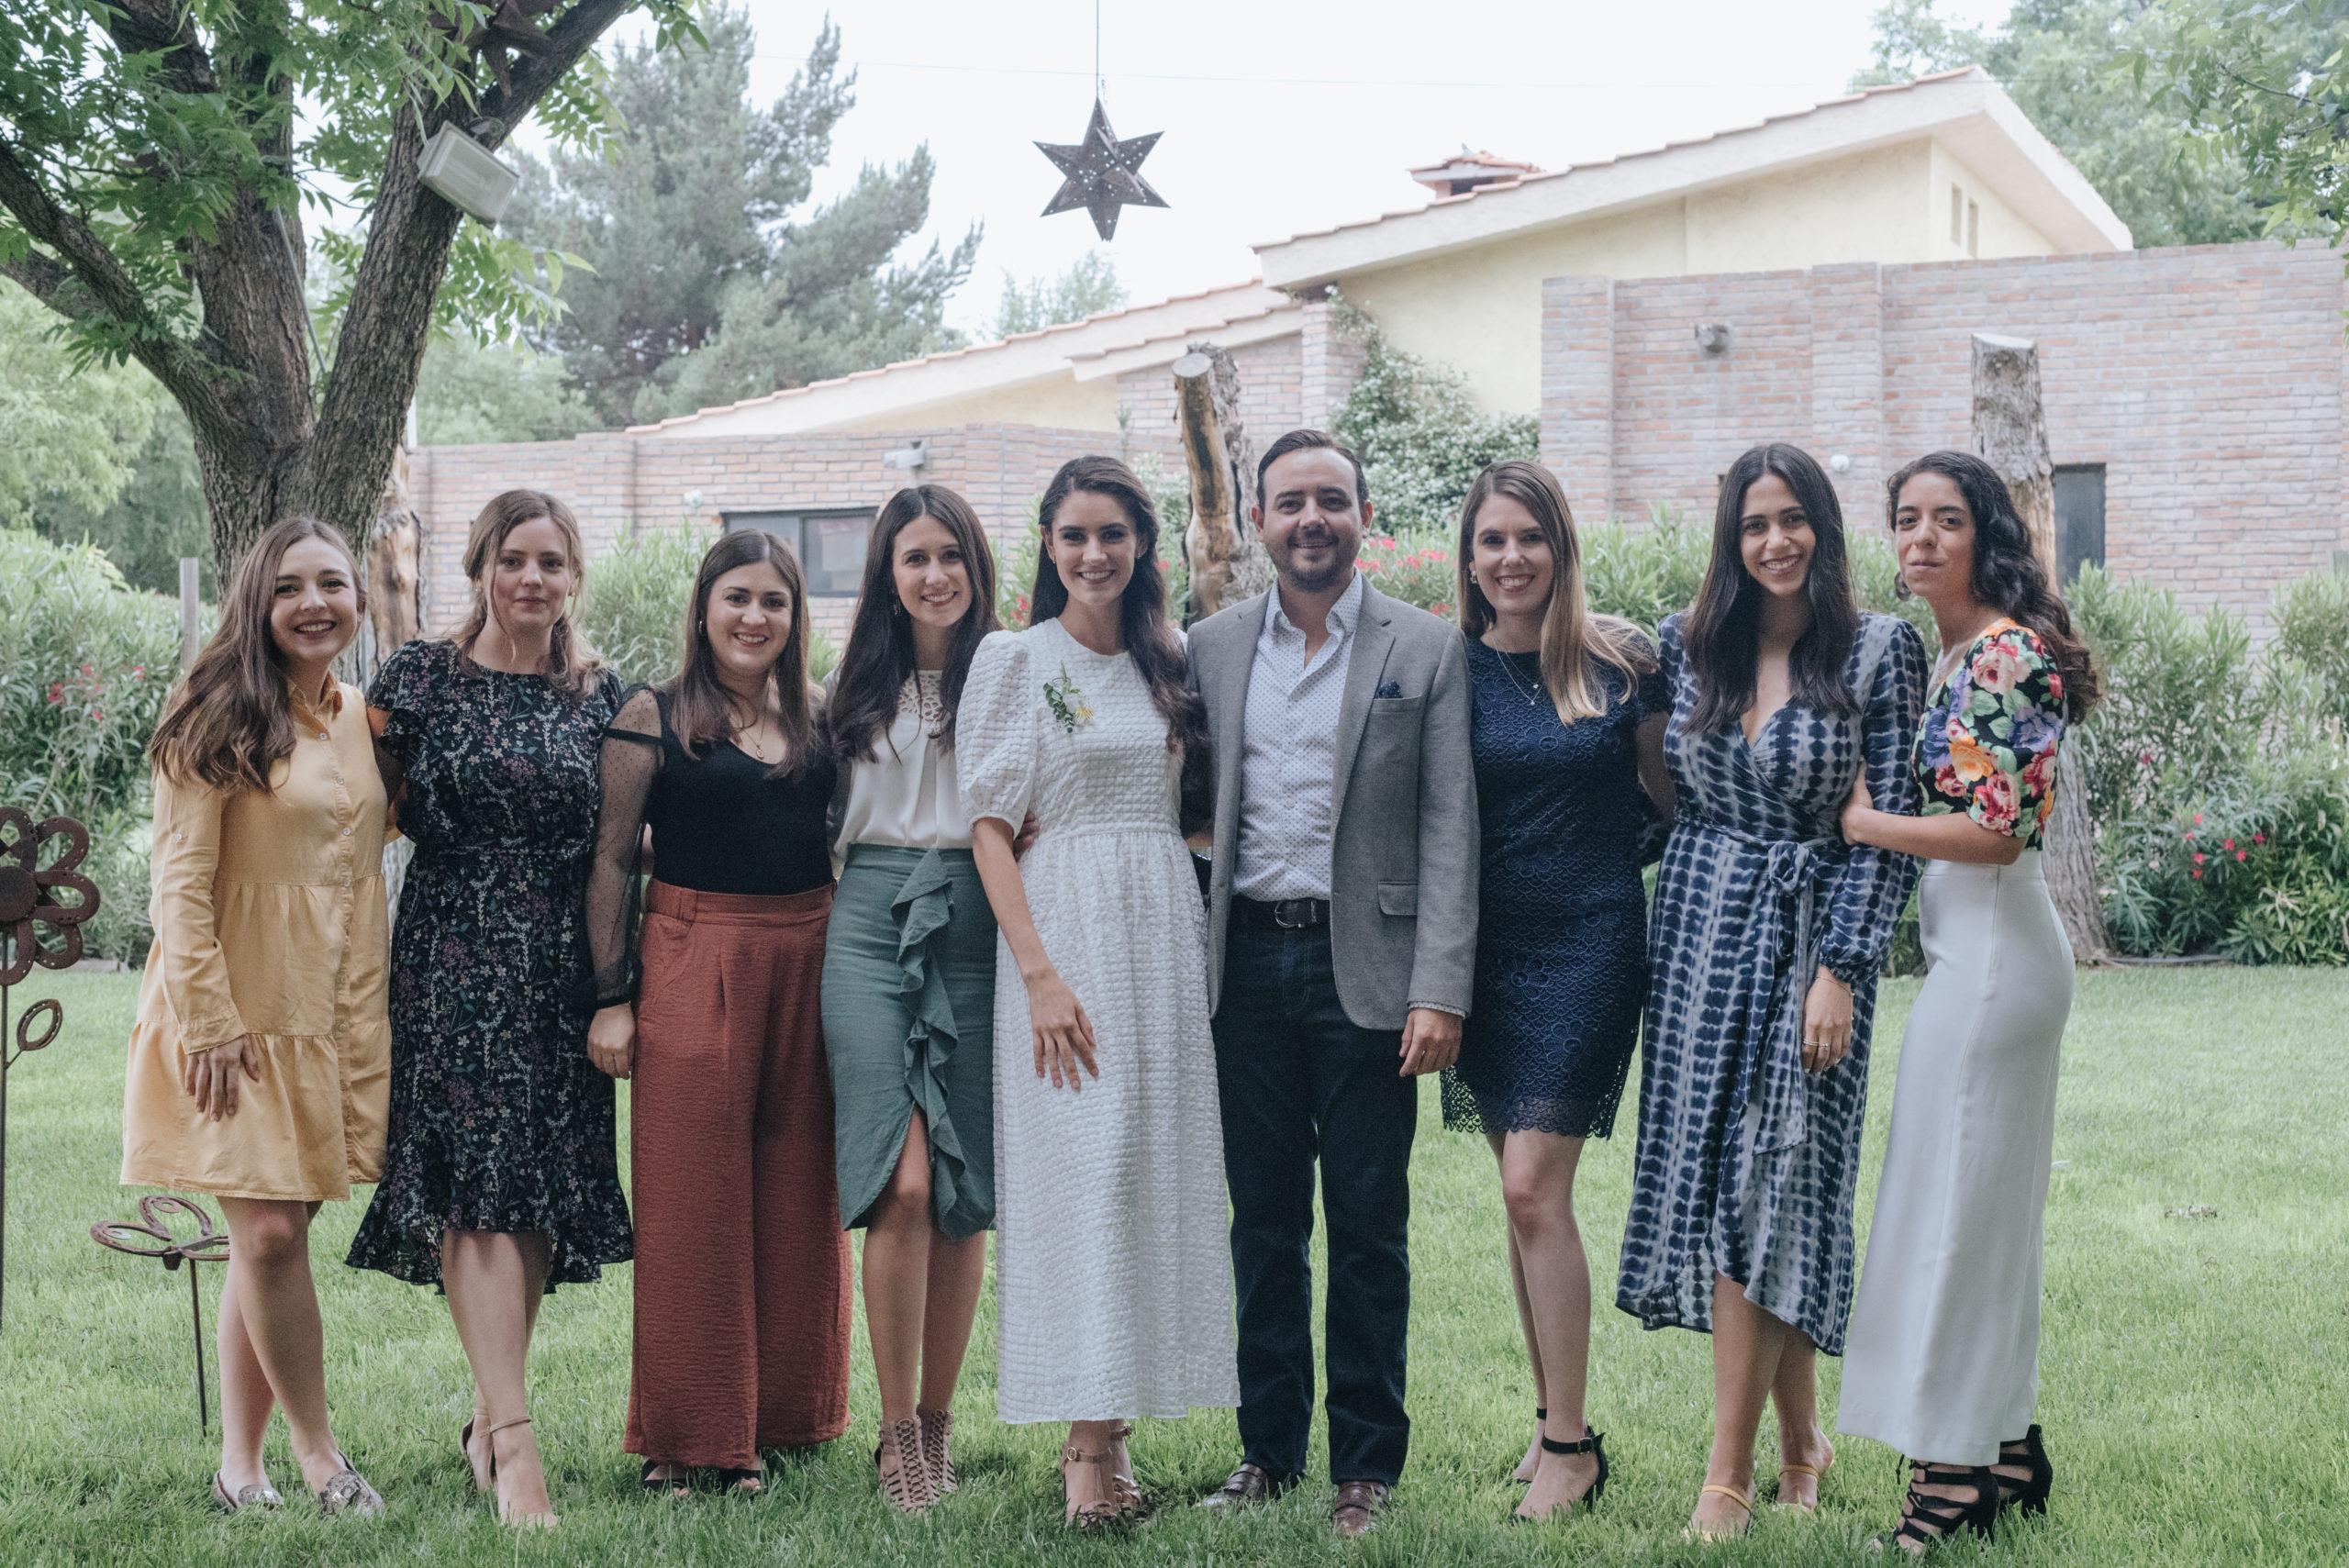 Carolina Vega, Liliana Salas, Sara Flores, Maru Treviño, Ana Gaby Herrera, Eduardo Dávila, Gaby Cepeda, Laura Dávila y Andrea Cardona.